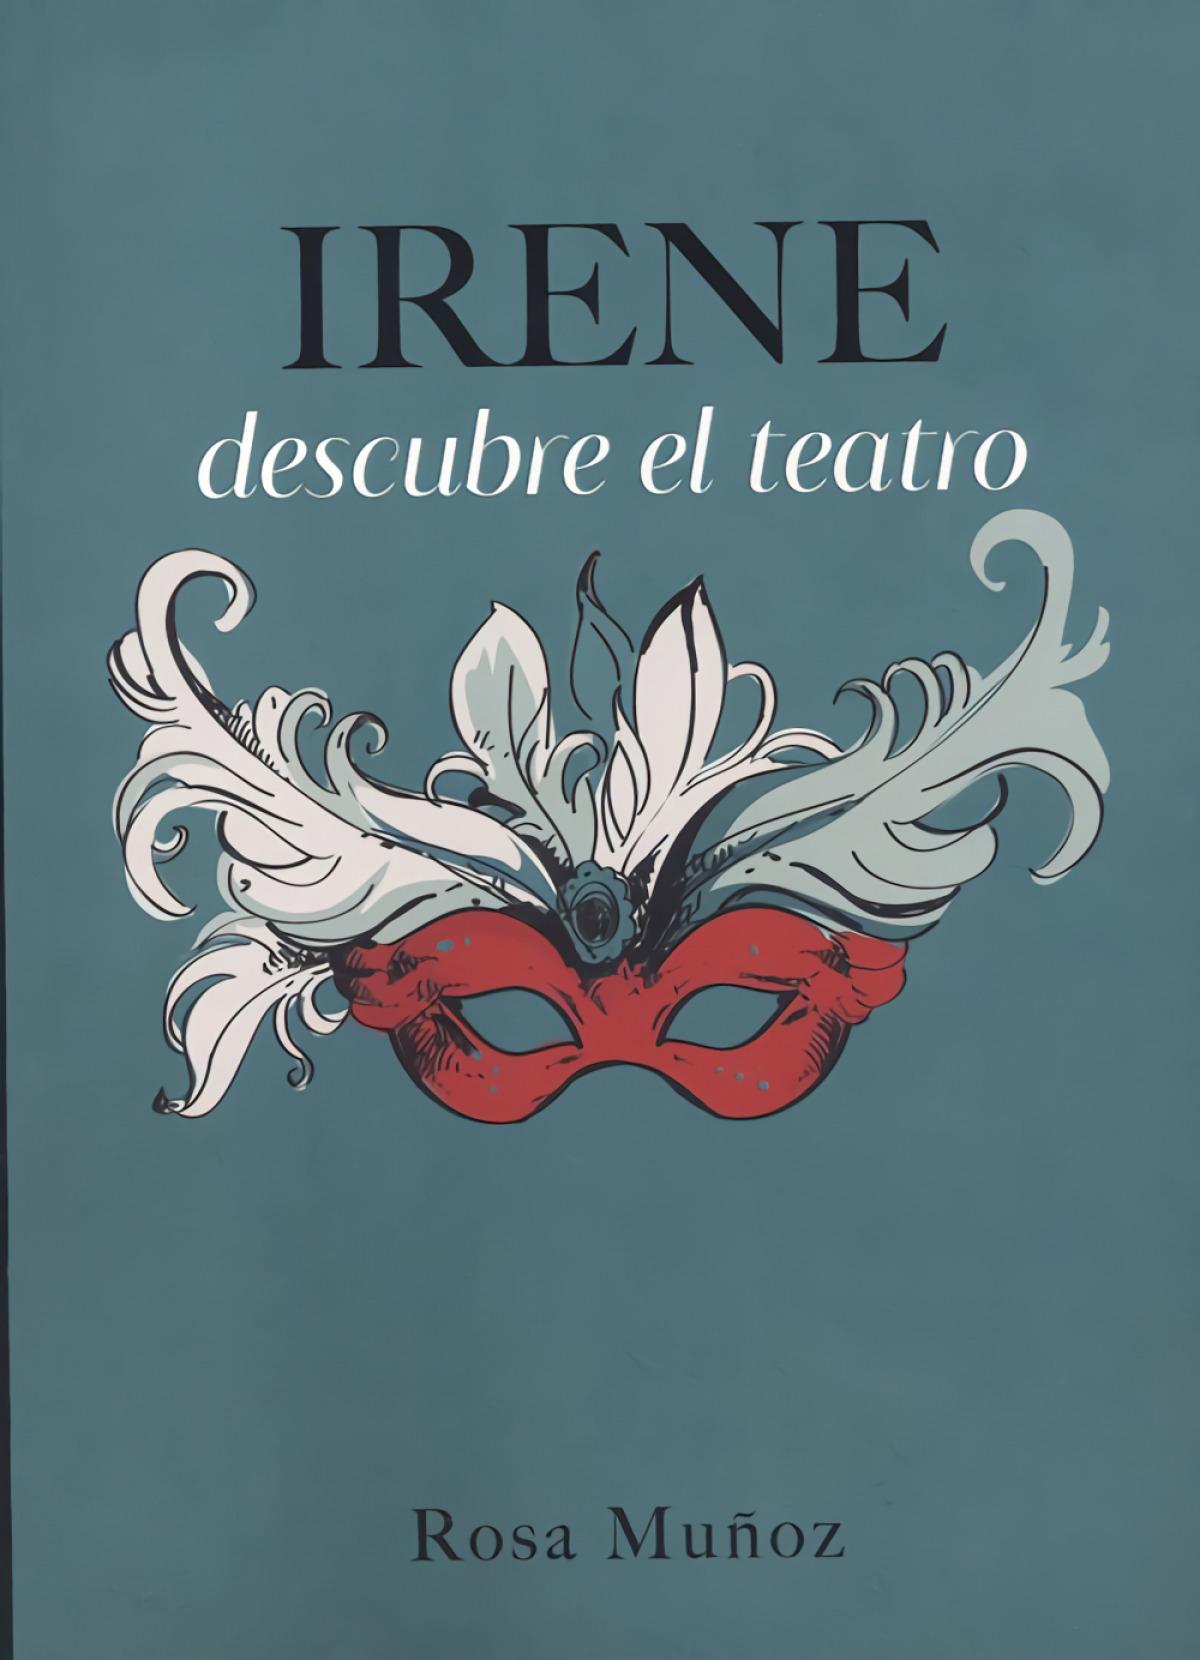 Irene descubre el teatro